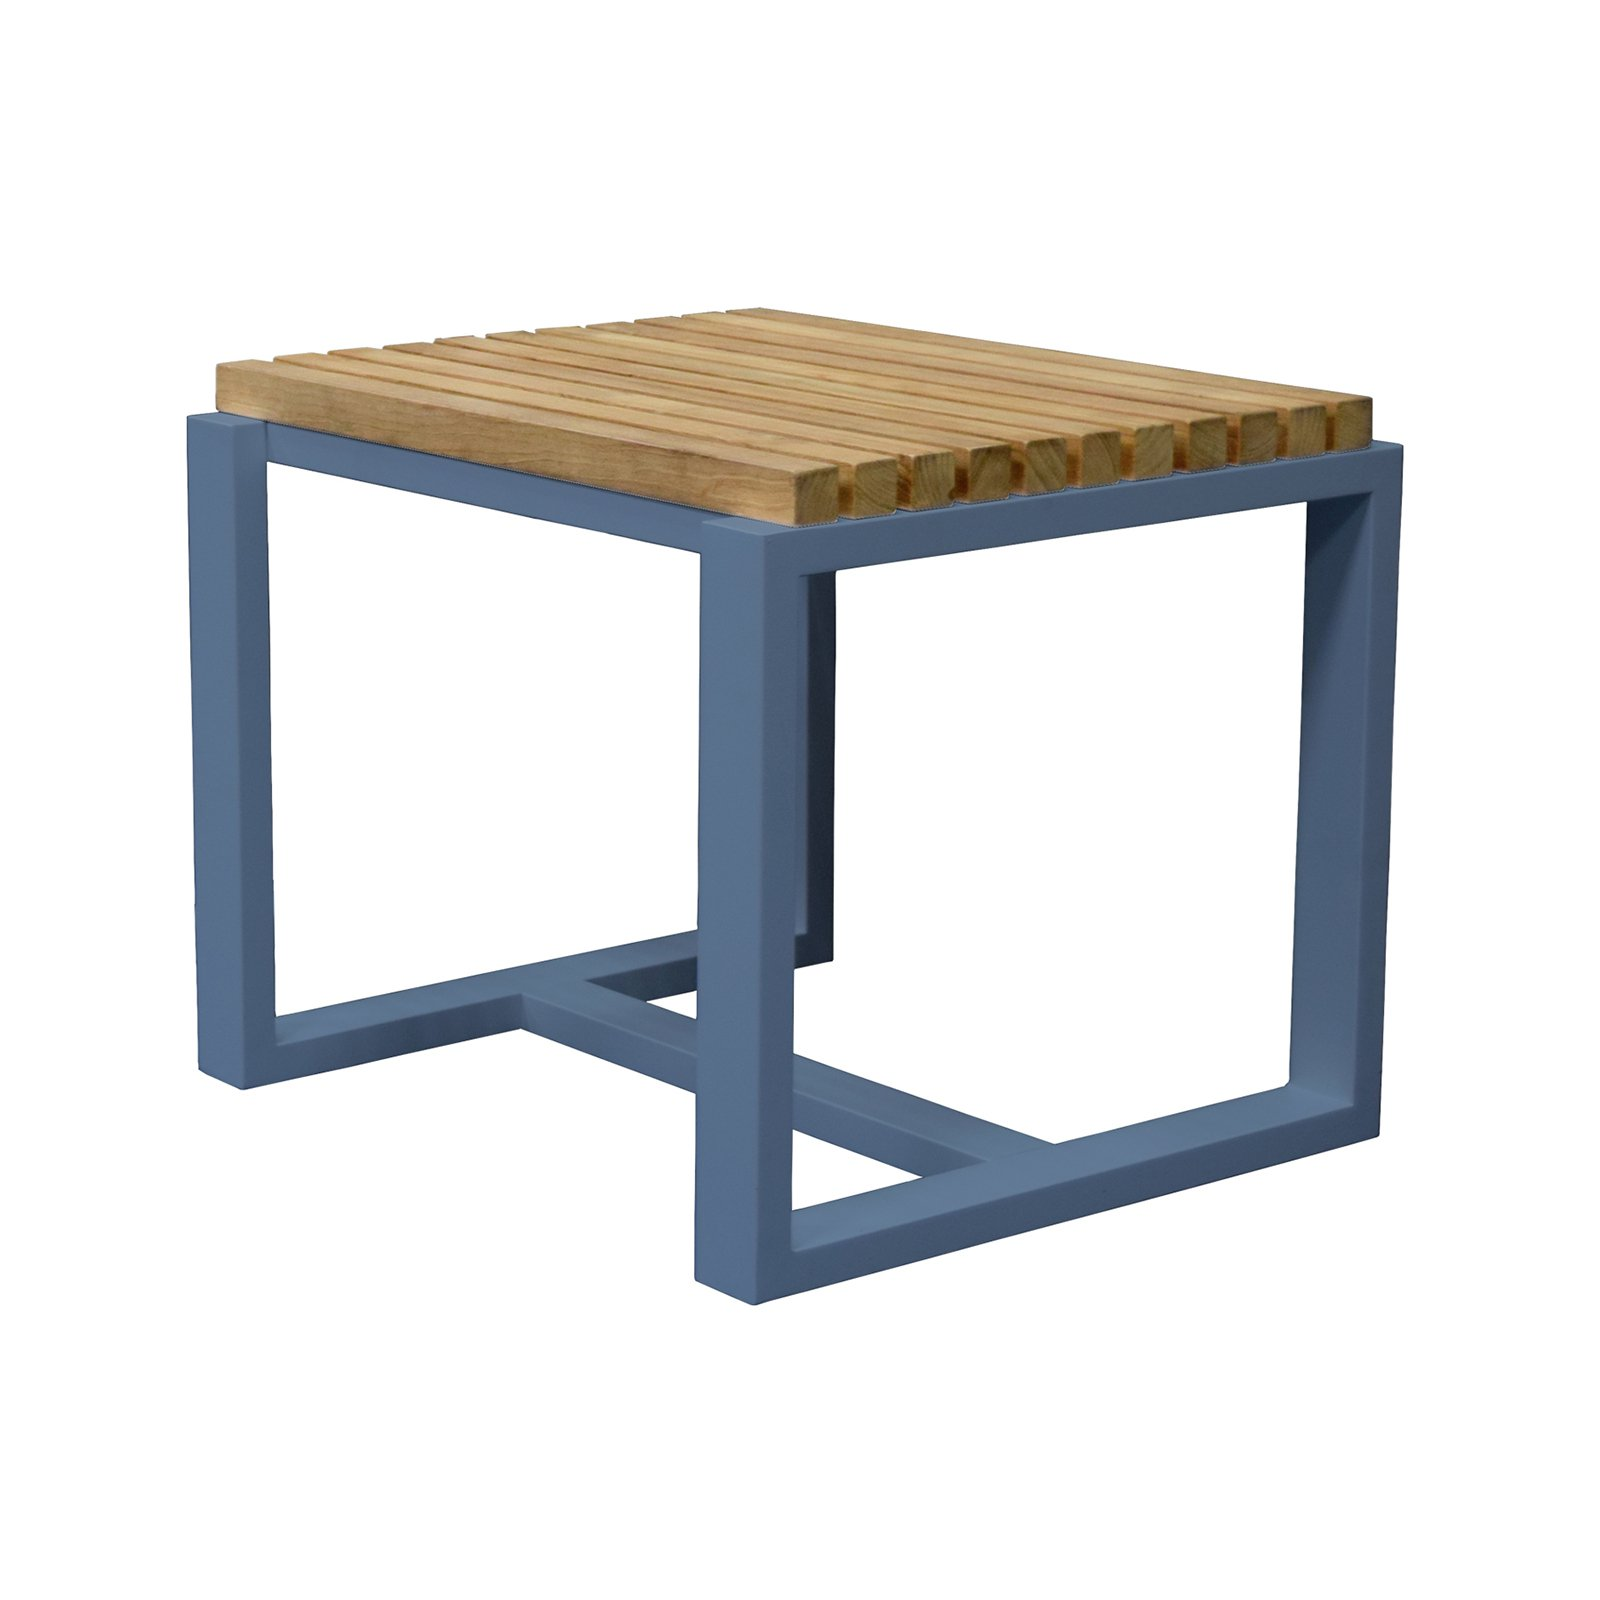 Asta Home Furnishings California Room Aspen Style Teak/Iron Patio Side Table